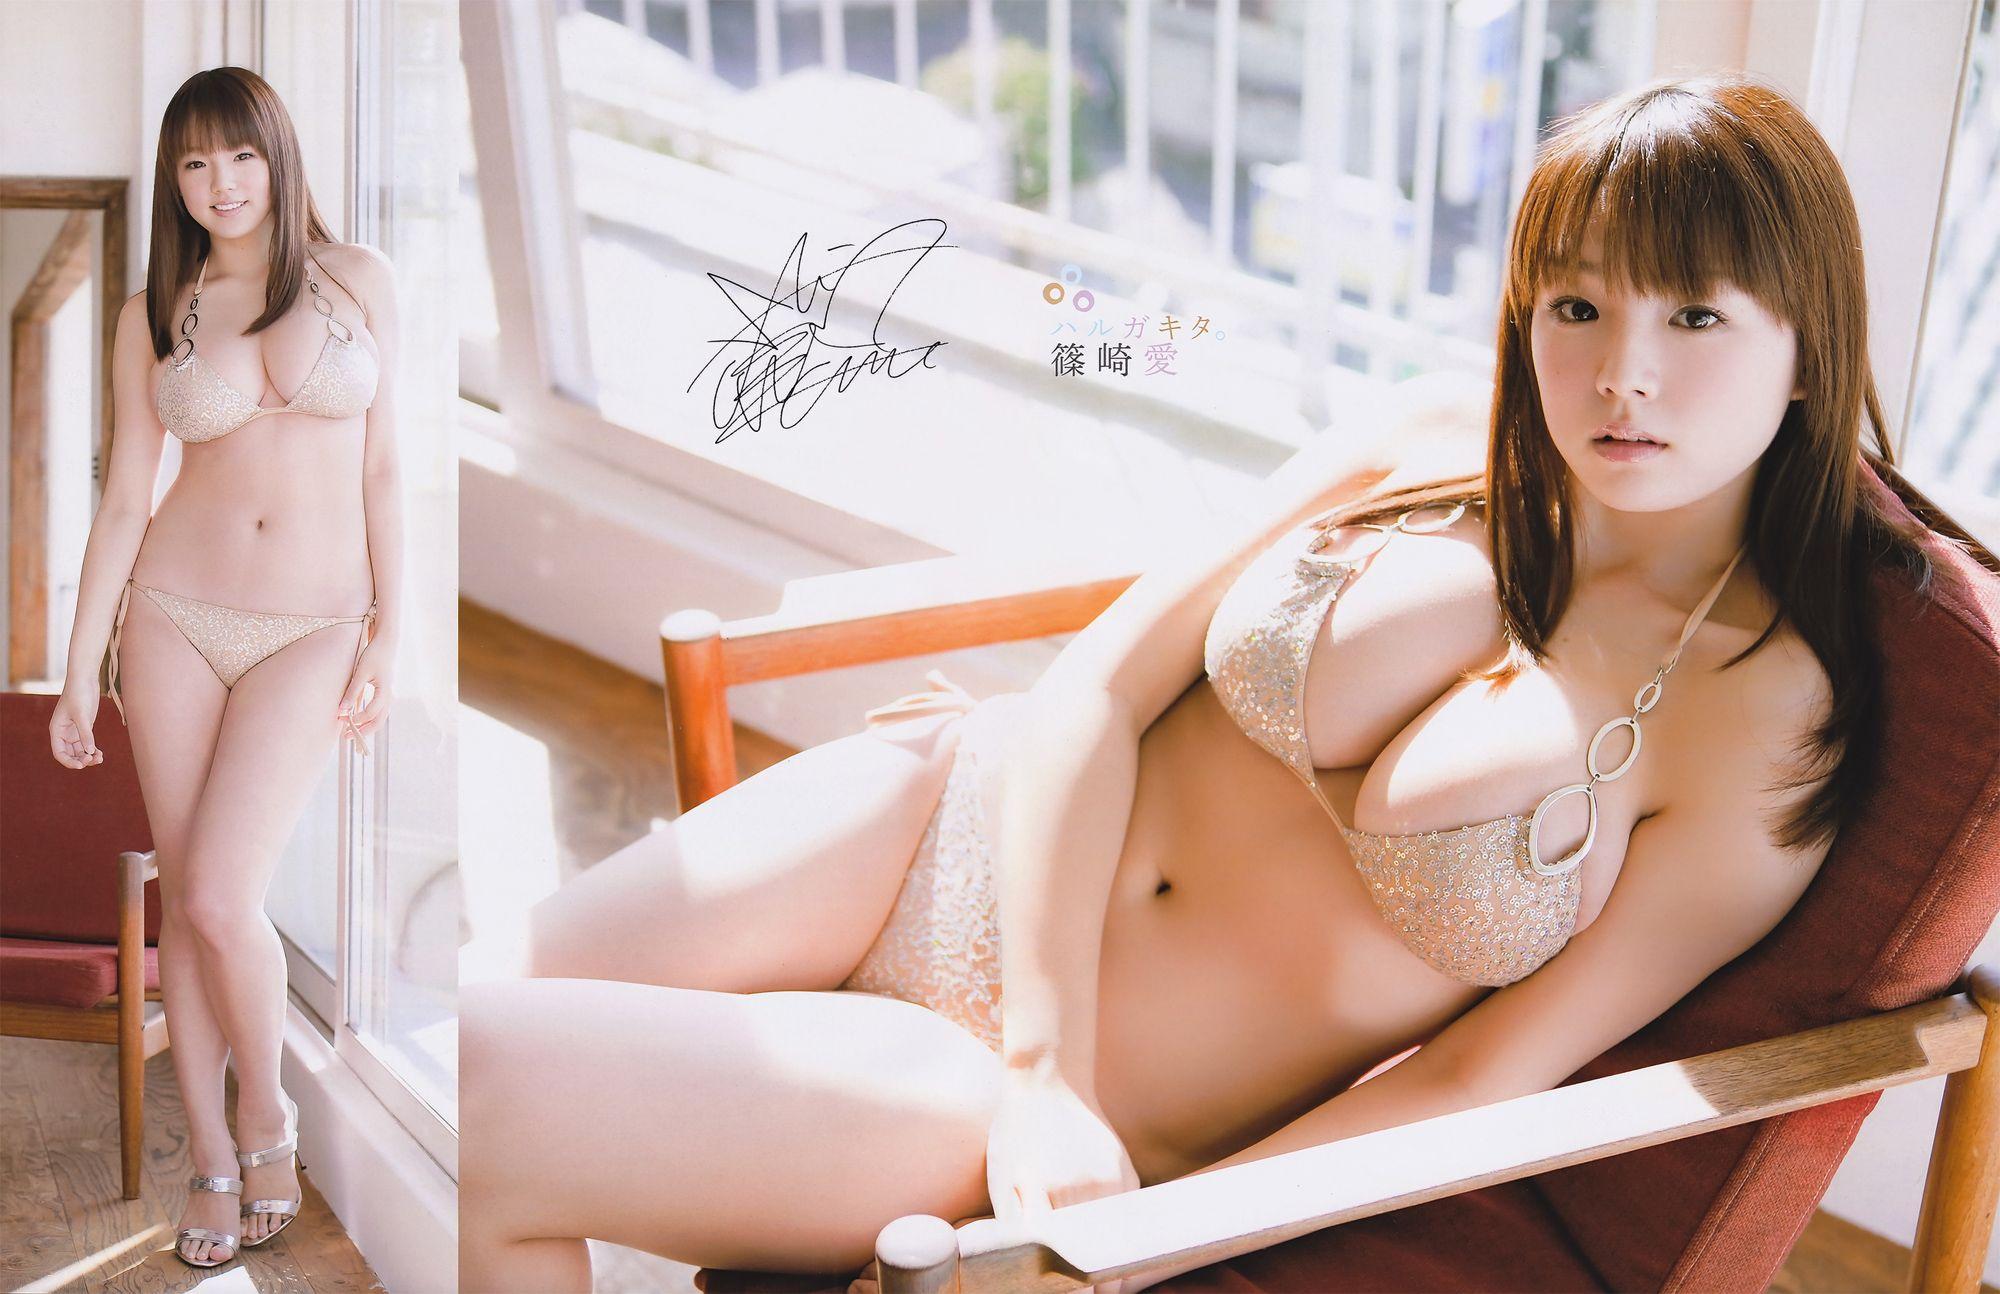 ai shinozaki. | ilove ai | pinterest | female models, asian and naked